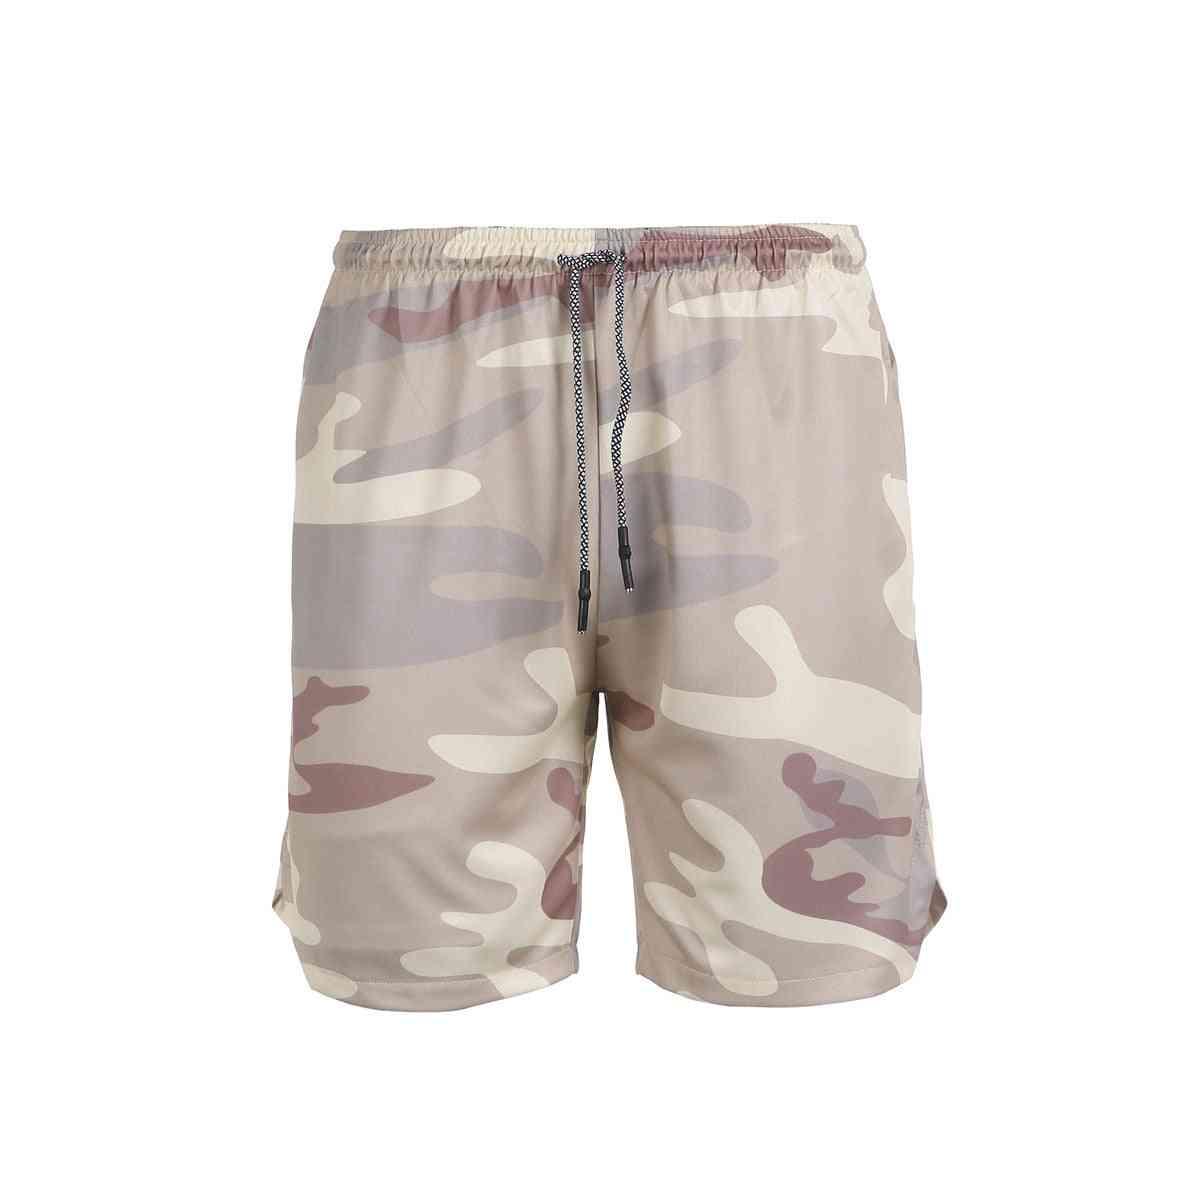 Men's Breathable Sports Shorts